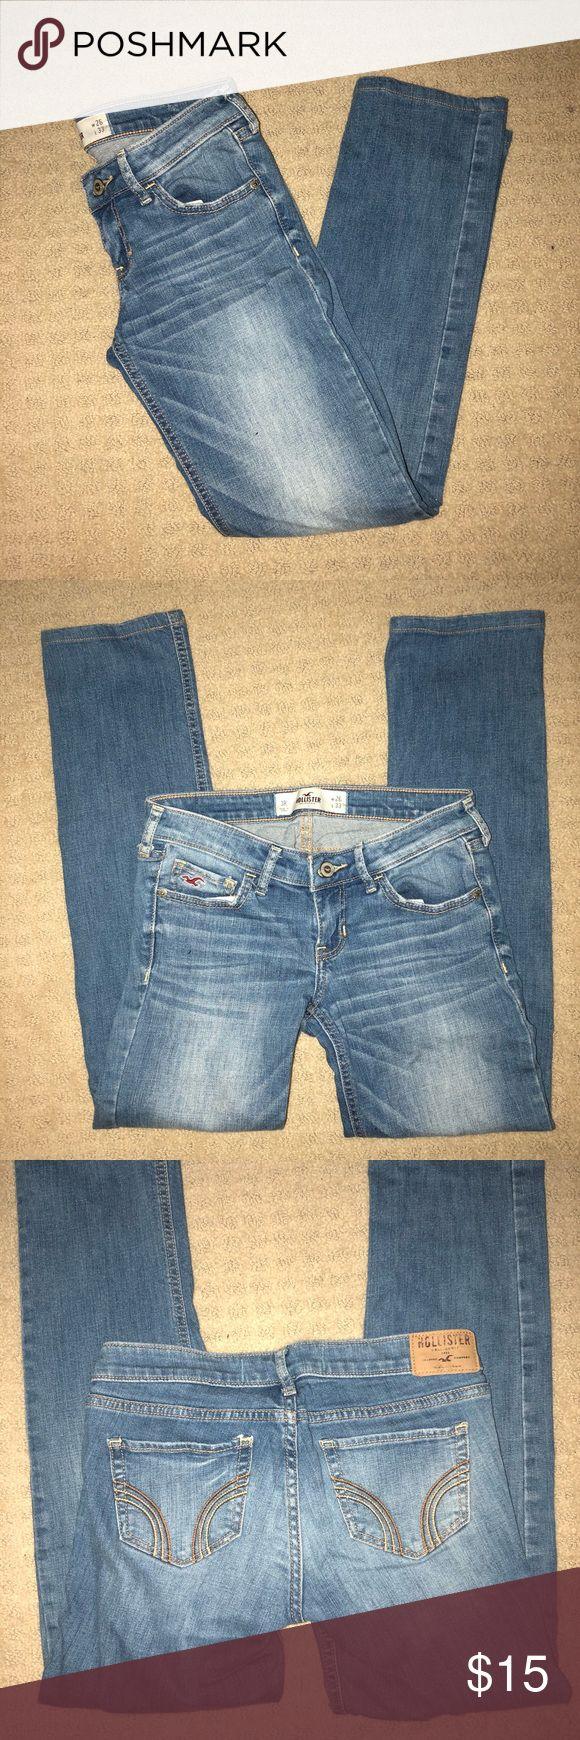 hollister boot cut jeans light-medium washed hollister boot cut jeans! Hollister Jeans Boot Cut